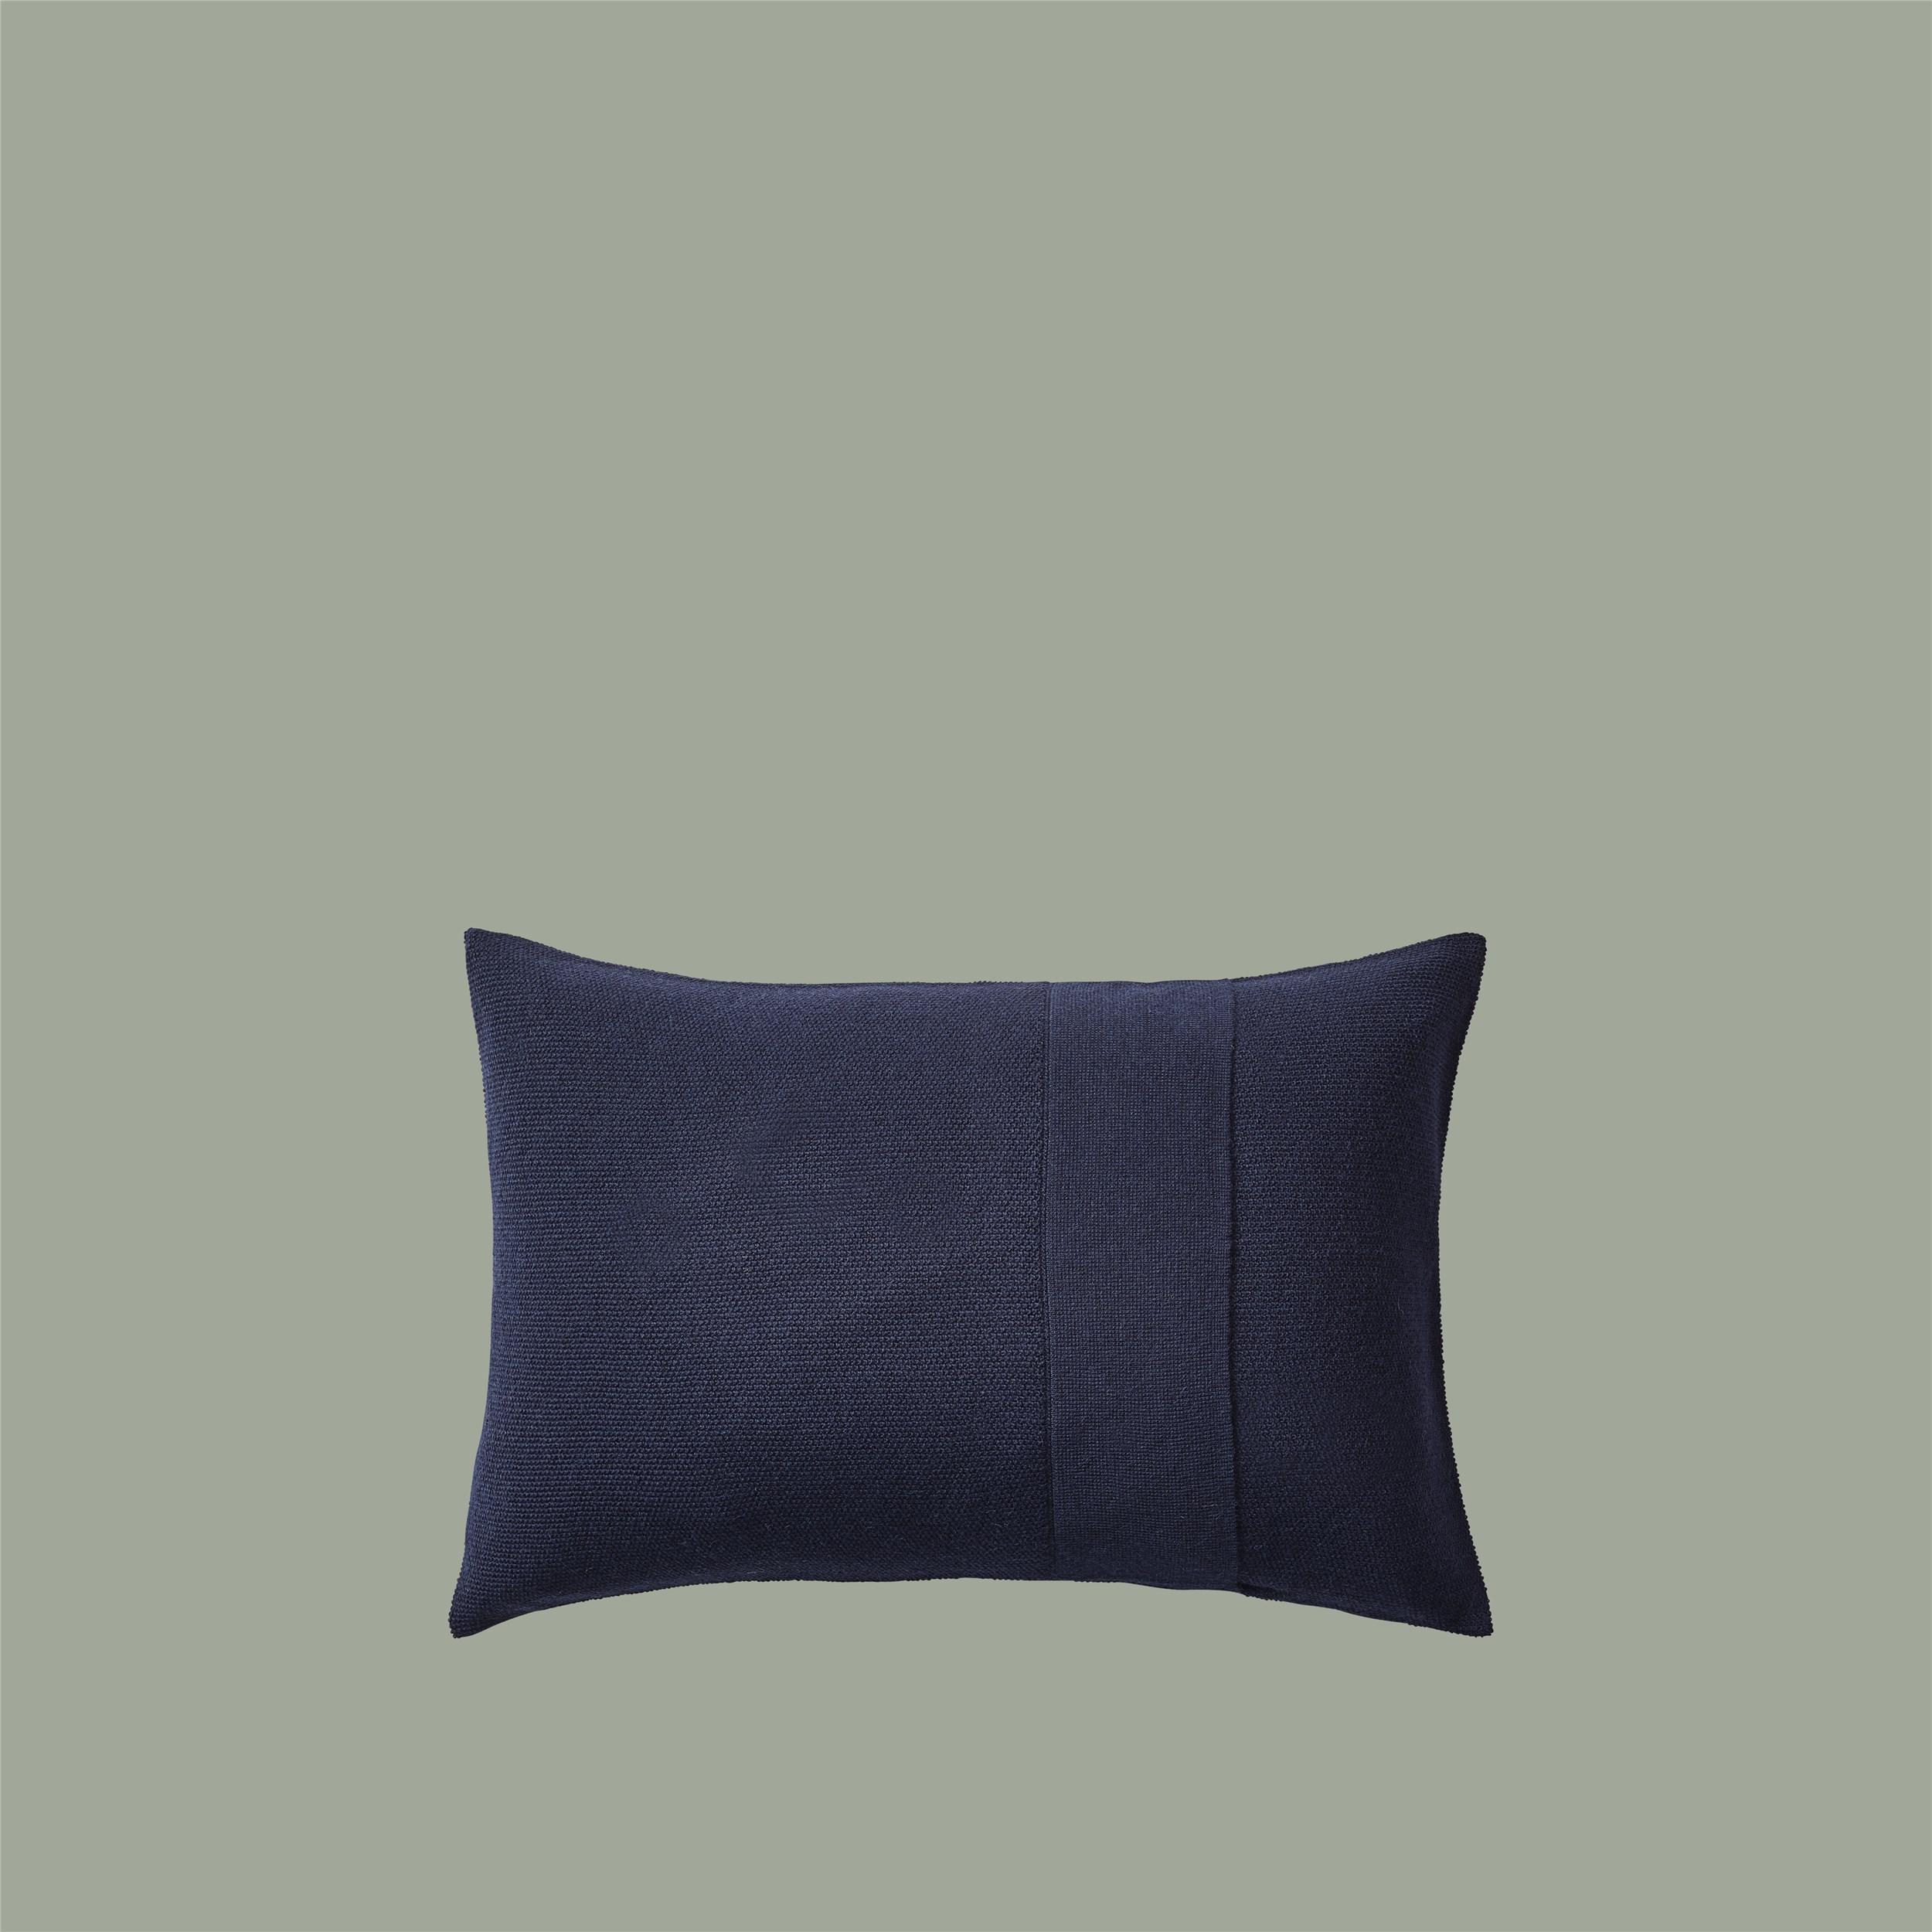 Layer Cushion 40x60 midnight blue